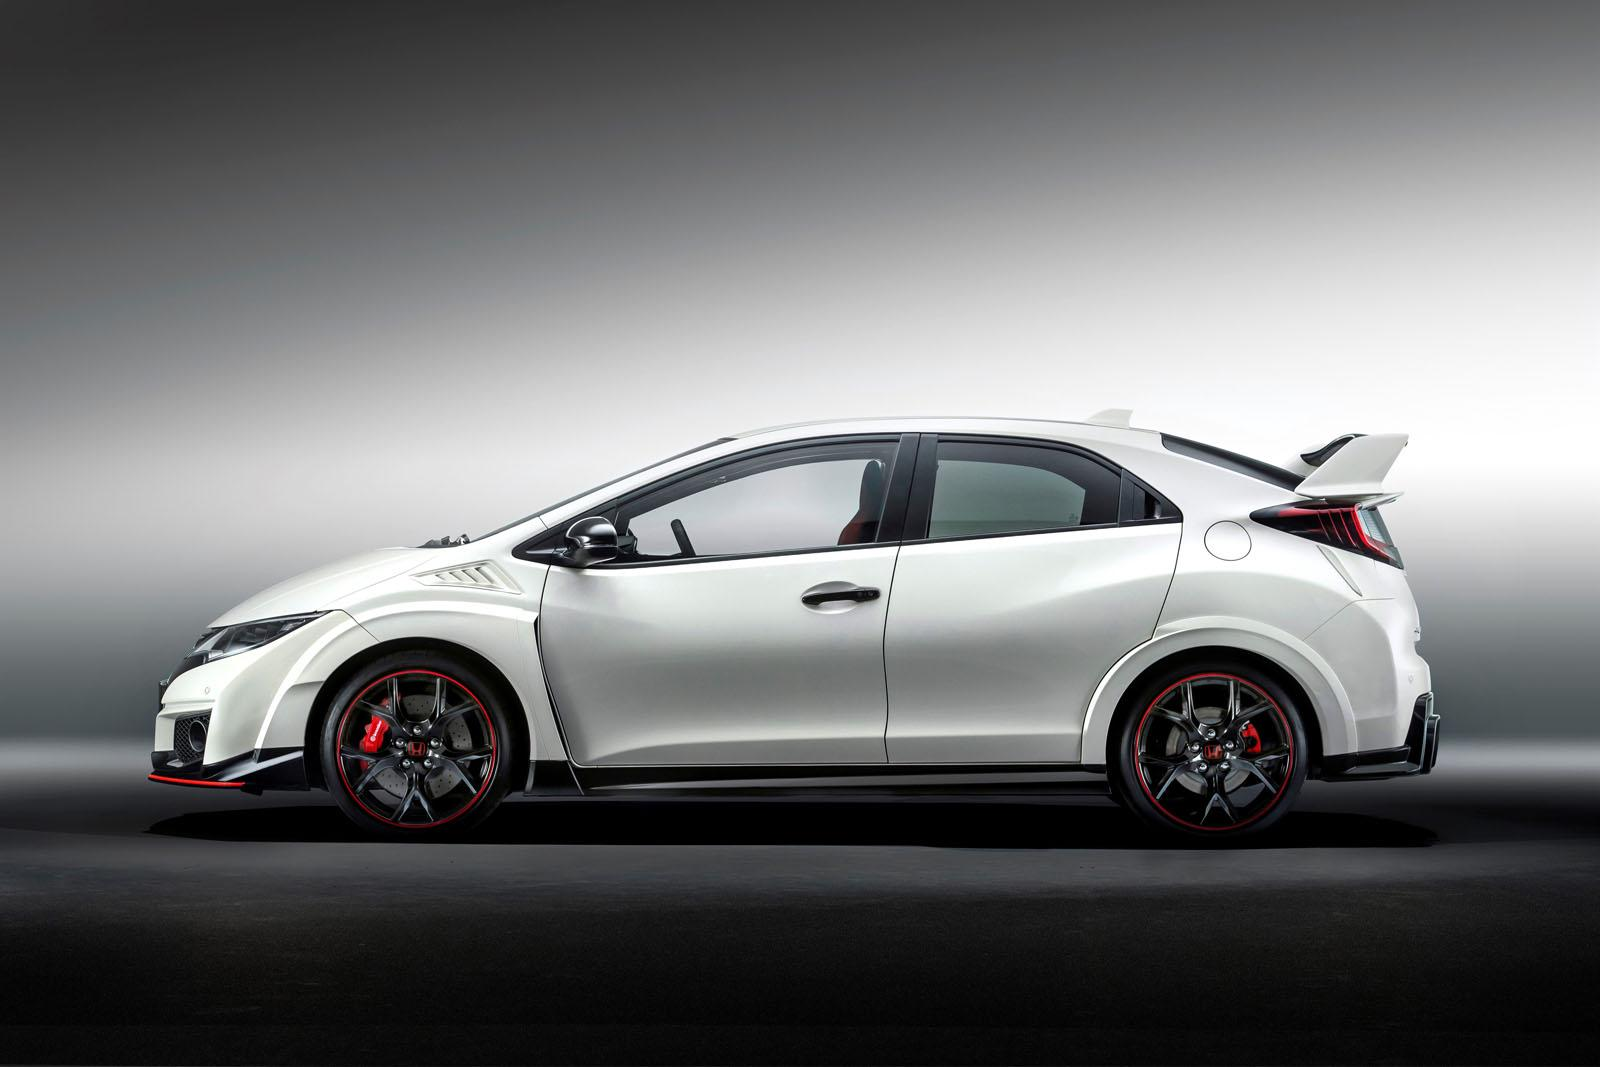 2016_Honda_Civic_Type_R_5 - YouWheel.com - Car News and Review